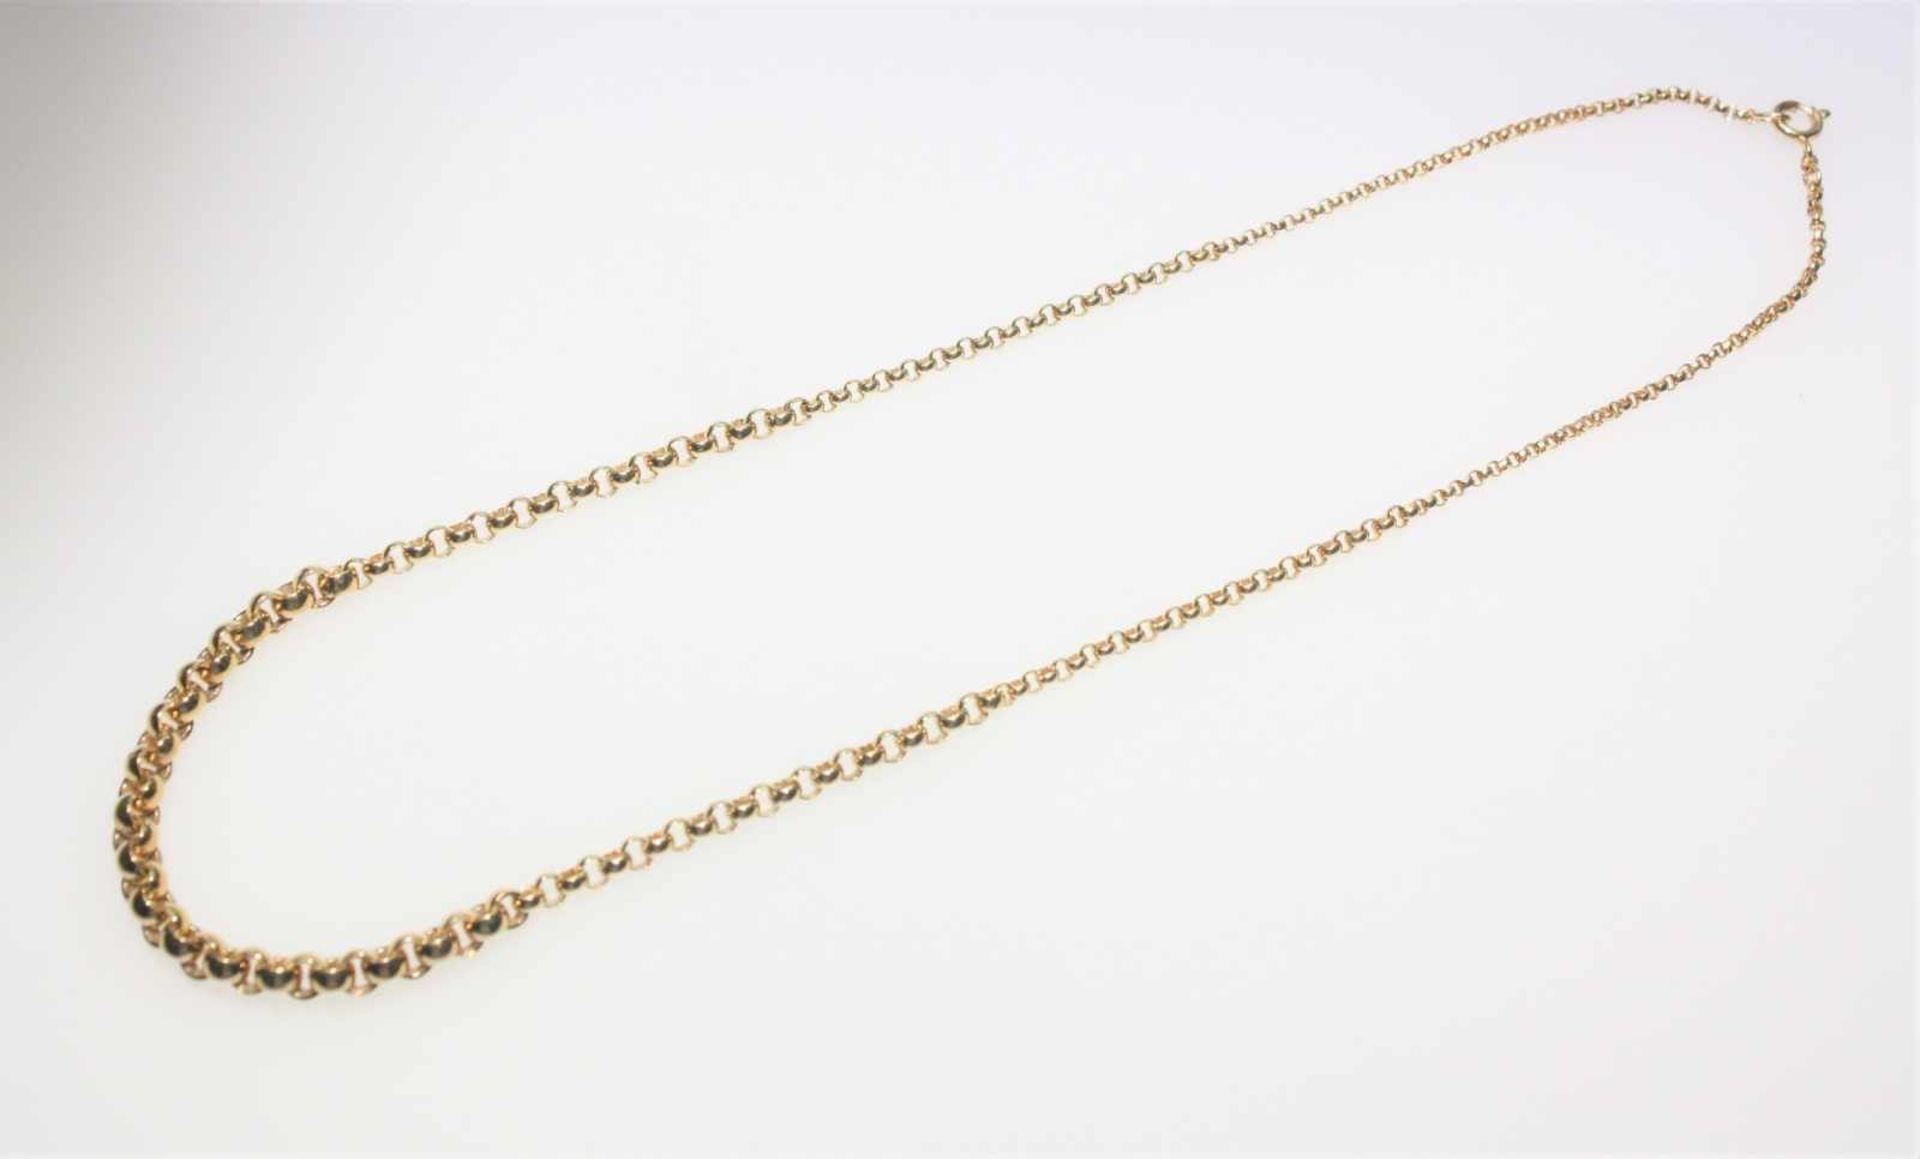 Los 37 - Goldene Kette im Verlauf 585/f gest., Erbsmuster, ca. 45 cm lang.Brgw. 17,0 g